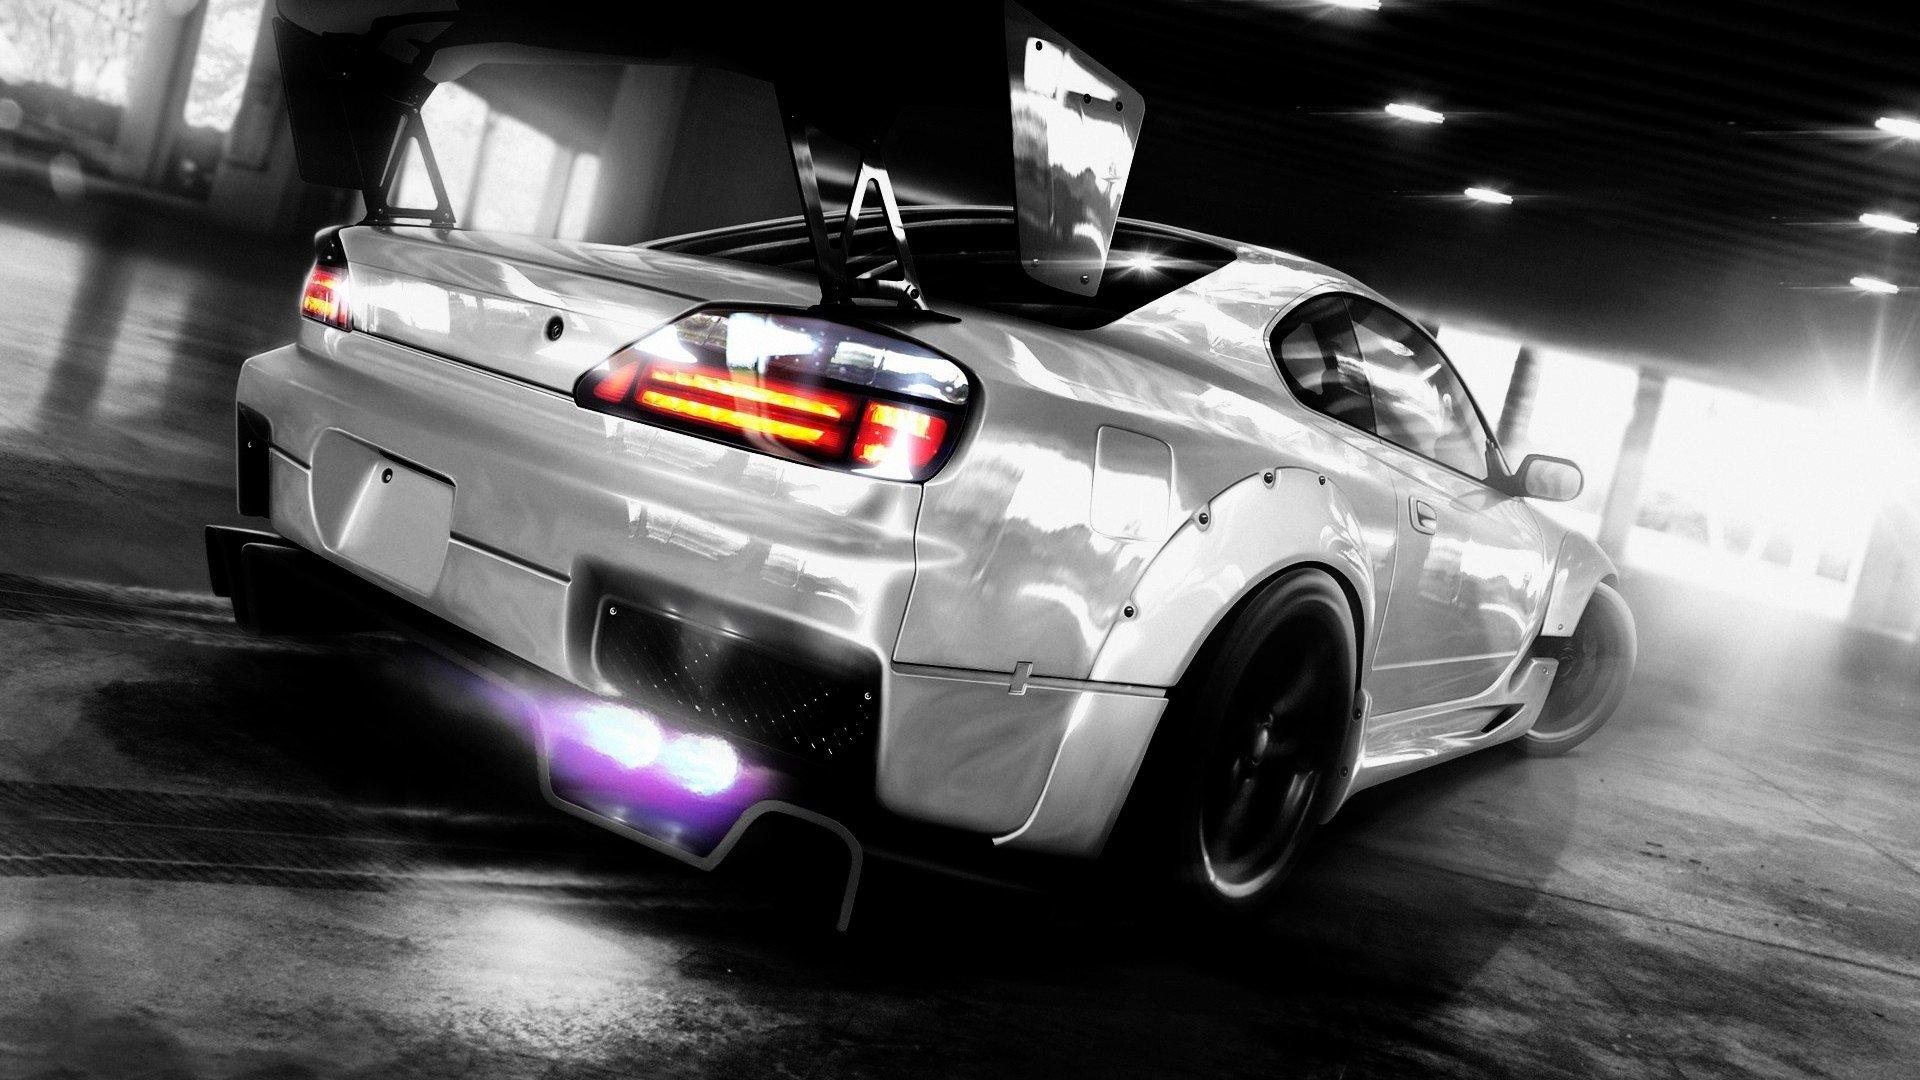 drifting cars tuning Nissan Silvia Nissan Silvia S15 wallpaper 1920x1080